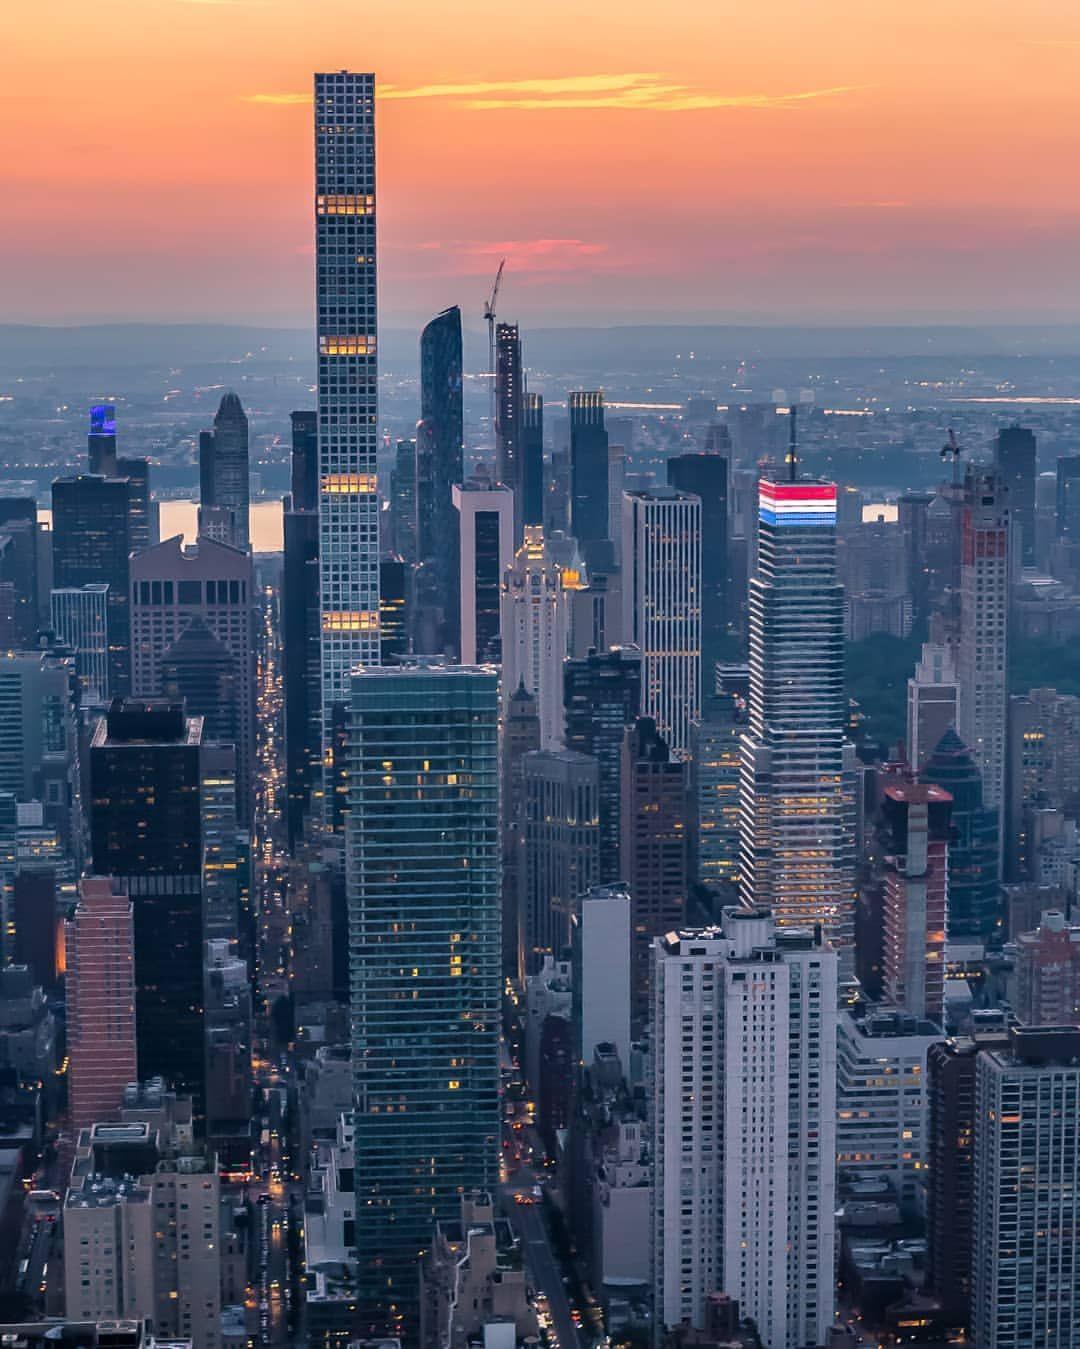 #newyork #newyorkcity #nyc #ilovenewyork #photography #manhattan  #architecture #instagram #newyorkphotography #bigapple #empirestatebuilding  # ...